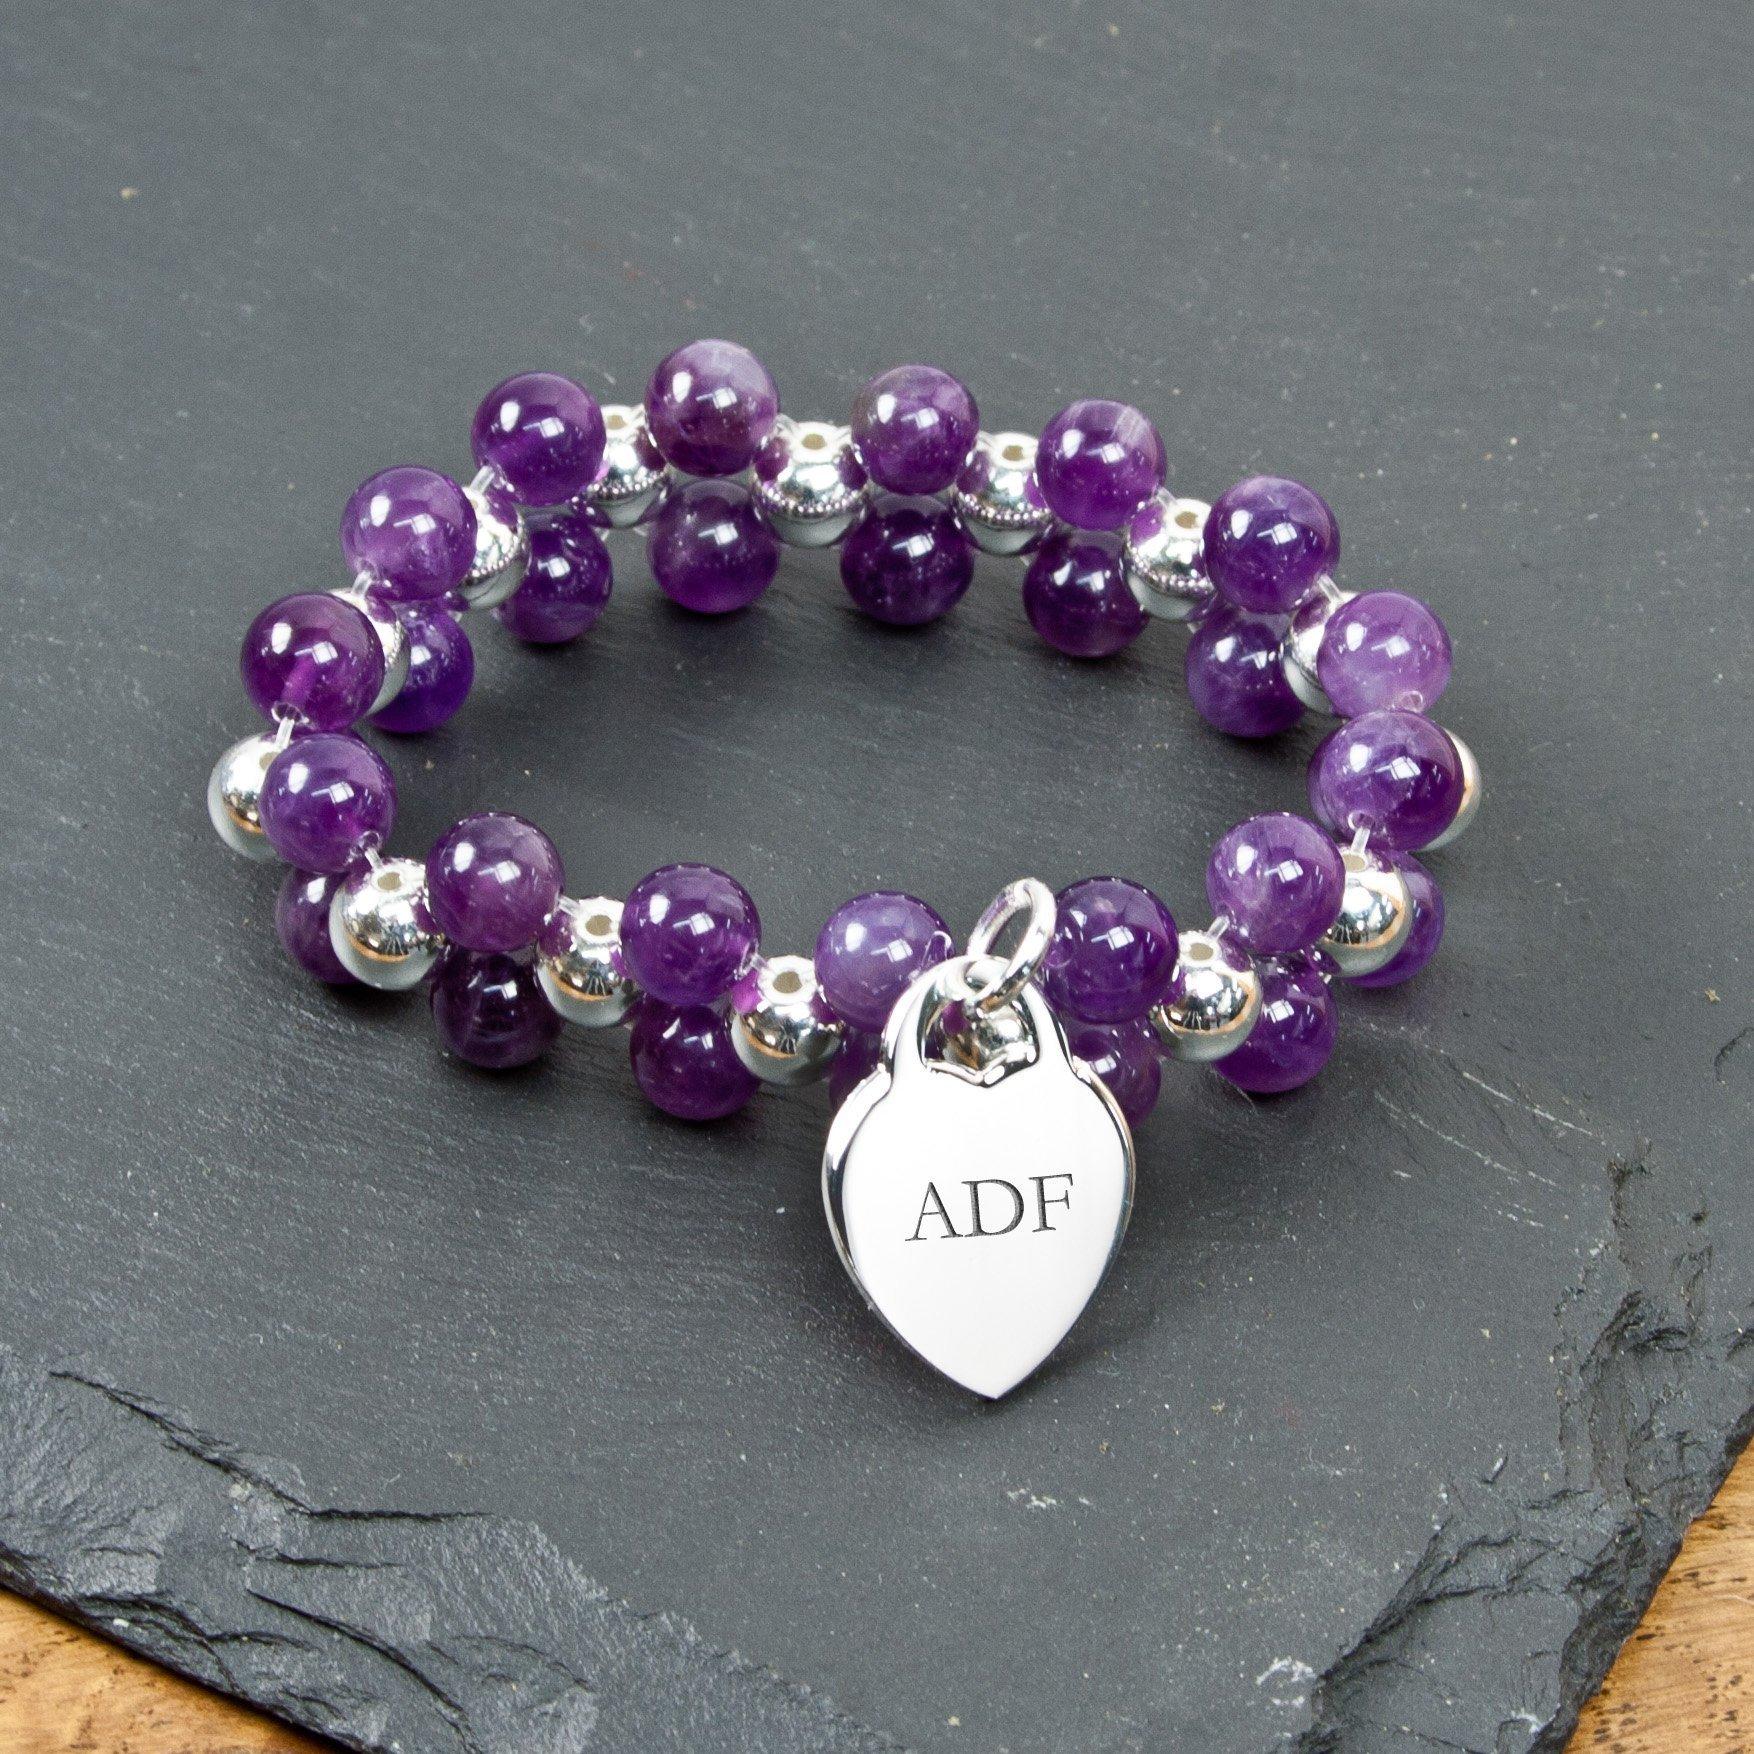 Personalised Amethyst Harmony Bracelet